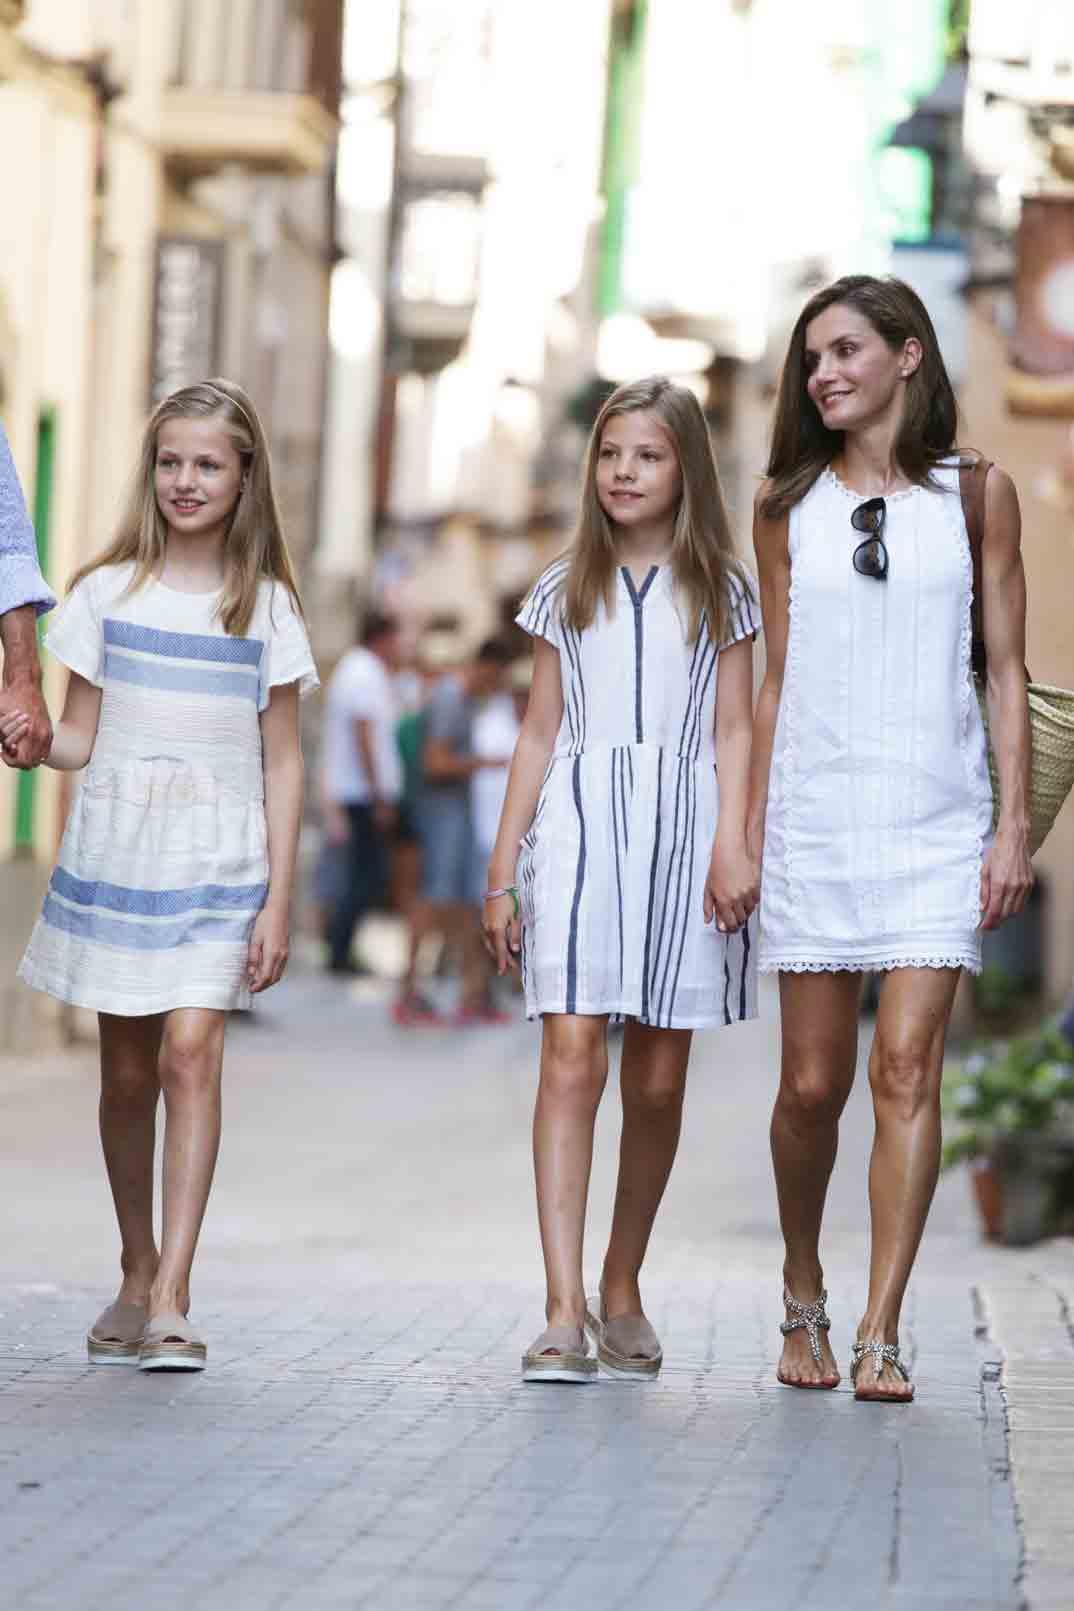 reyes de españa con sus hijas paseo por las calles de mallorca